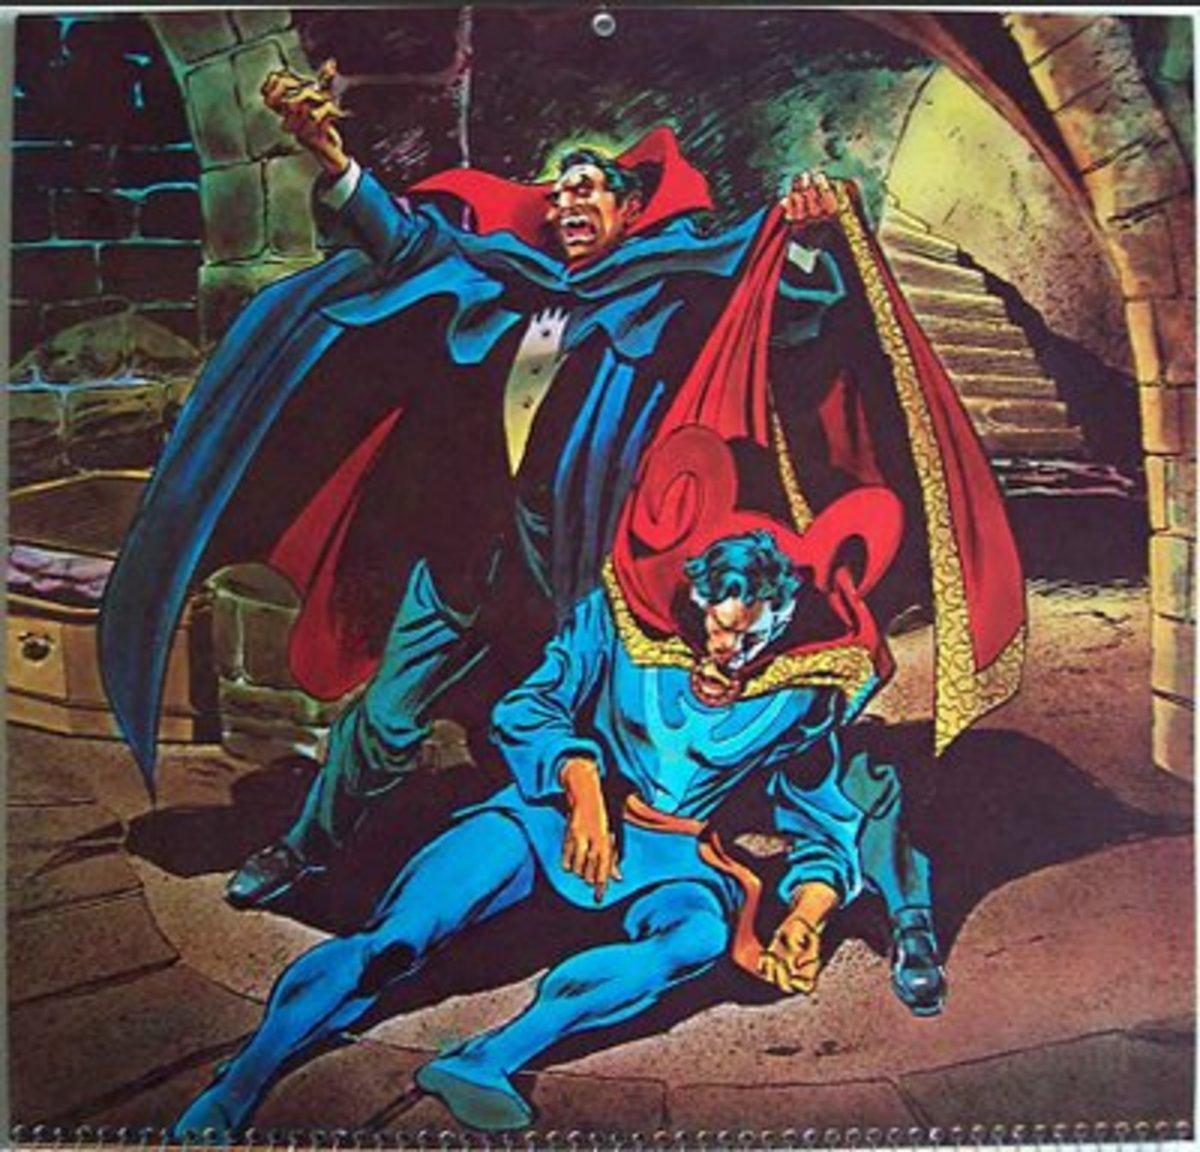 Dracula versus Doctor Strange